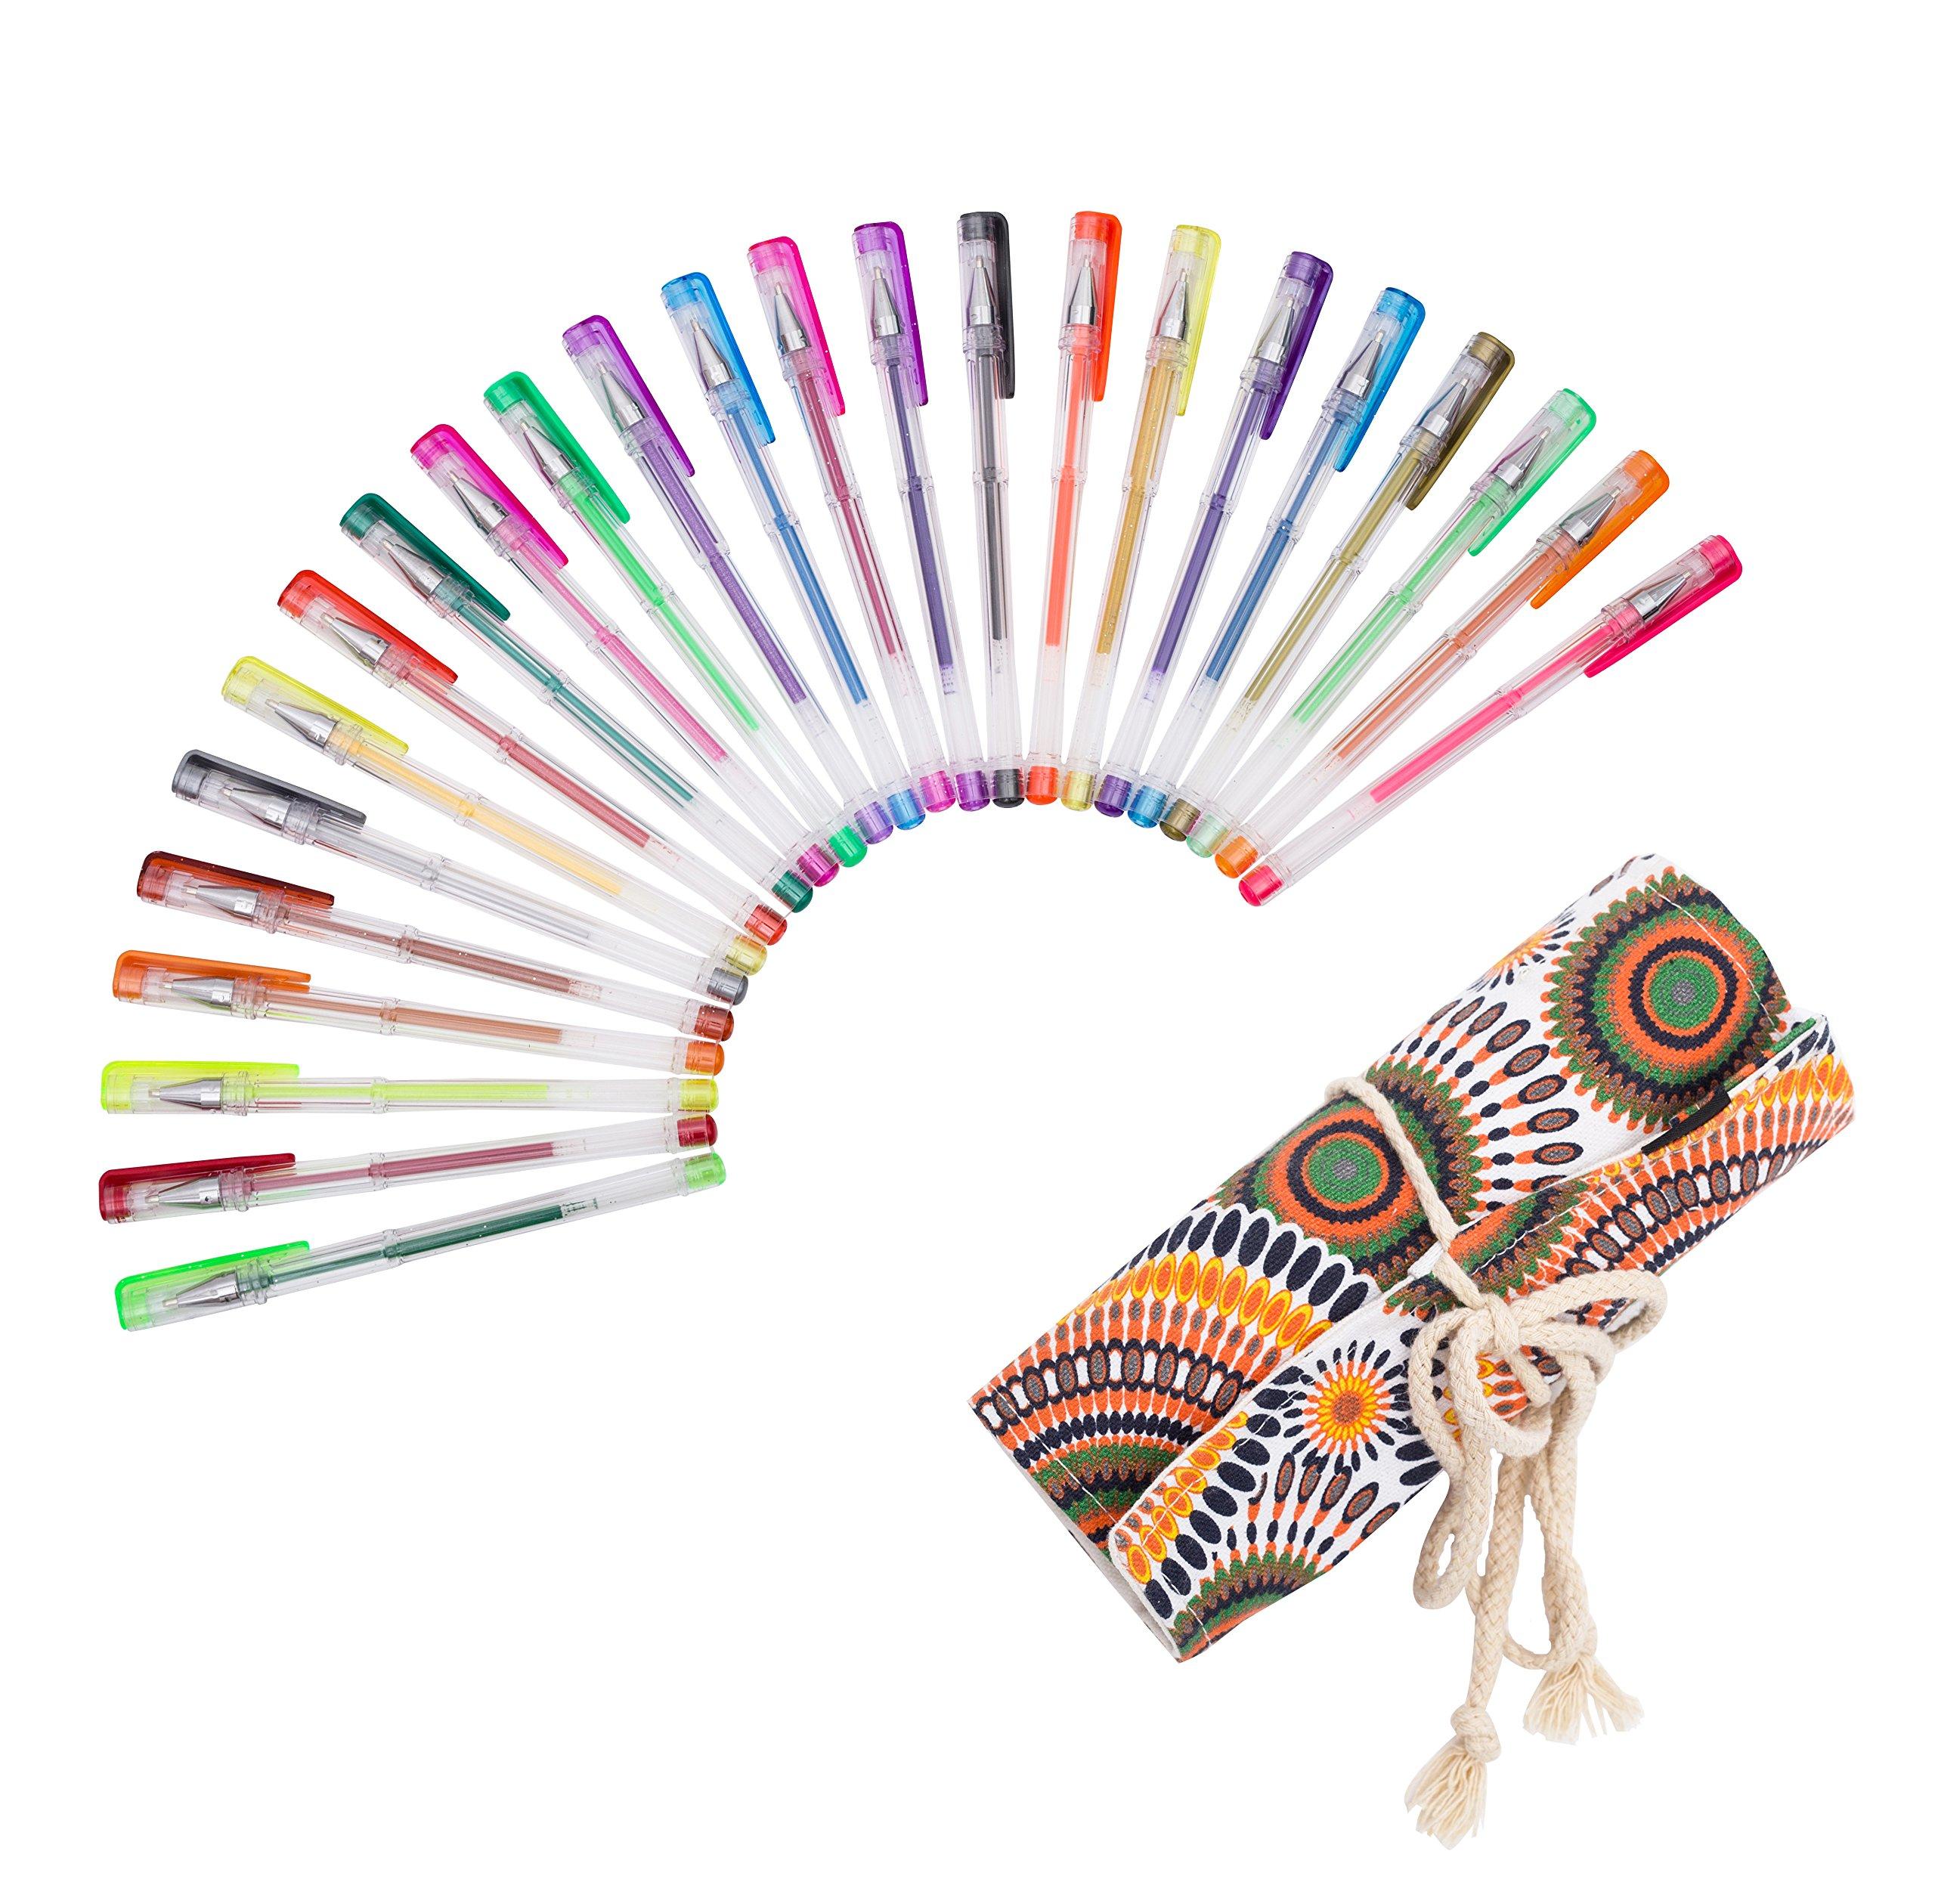 Exerz ART EXGL24A 24 PCS colour gel pens set with a string wrap – roll up pouch, fine ink ballpoint pens,, vibrant colour, free flowing, glitter pens, neon, metallic, glitter neon